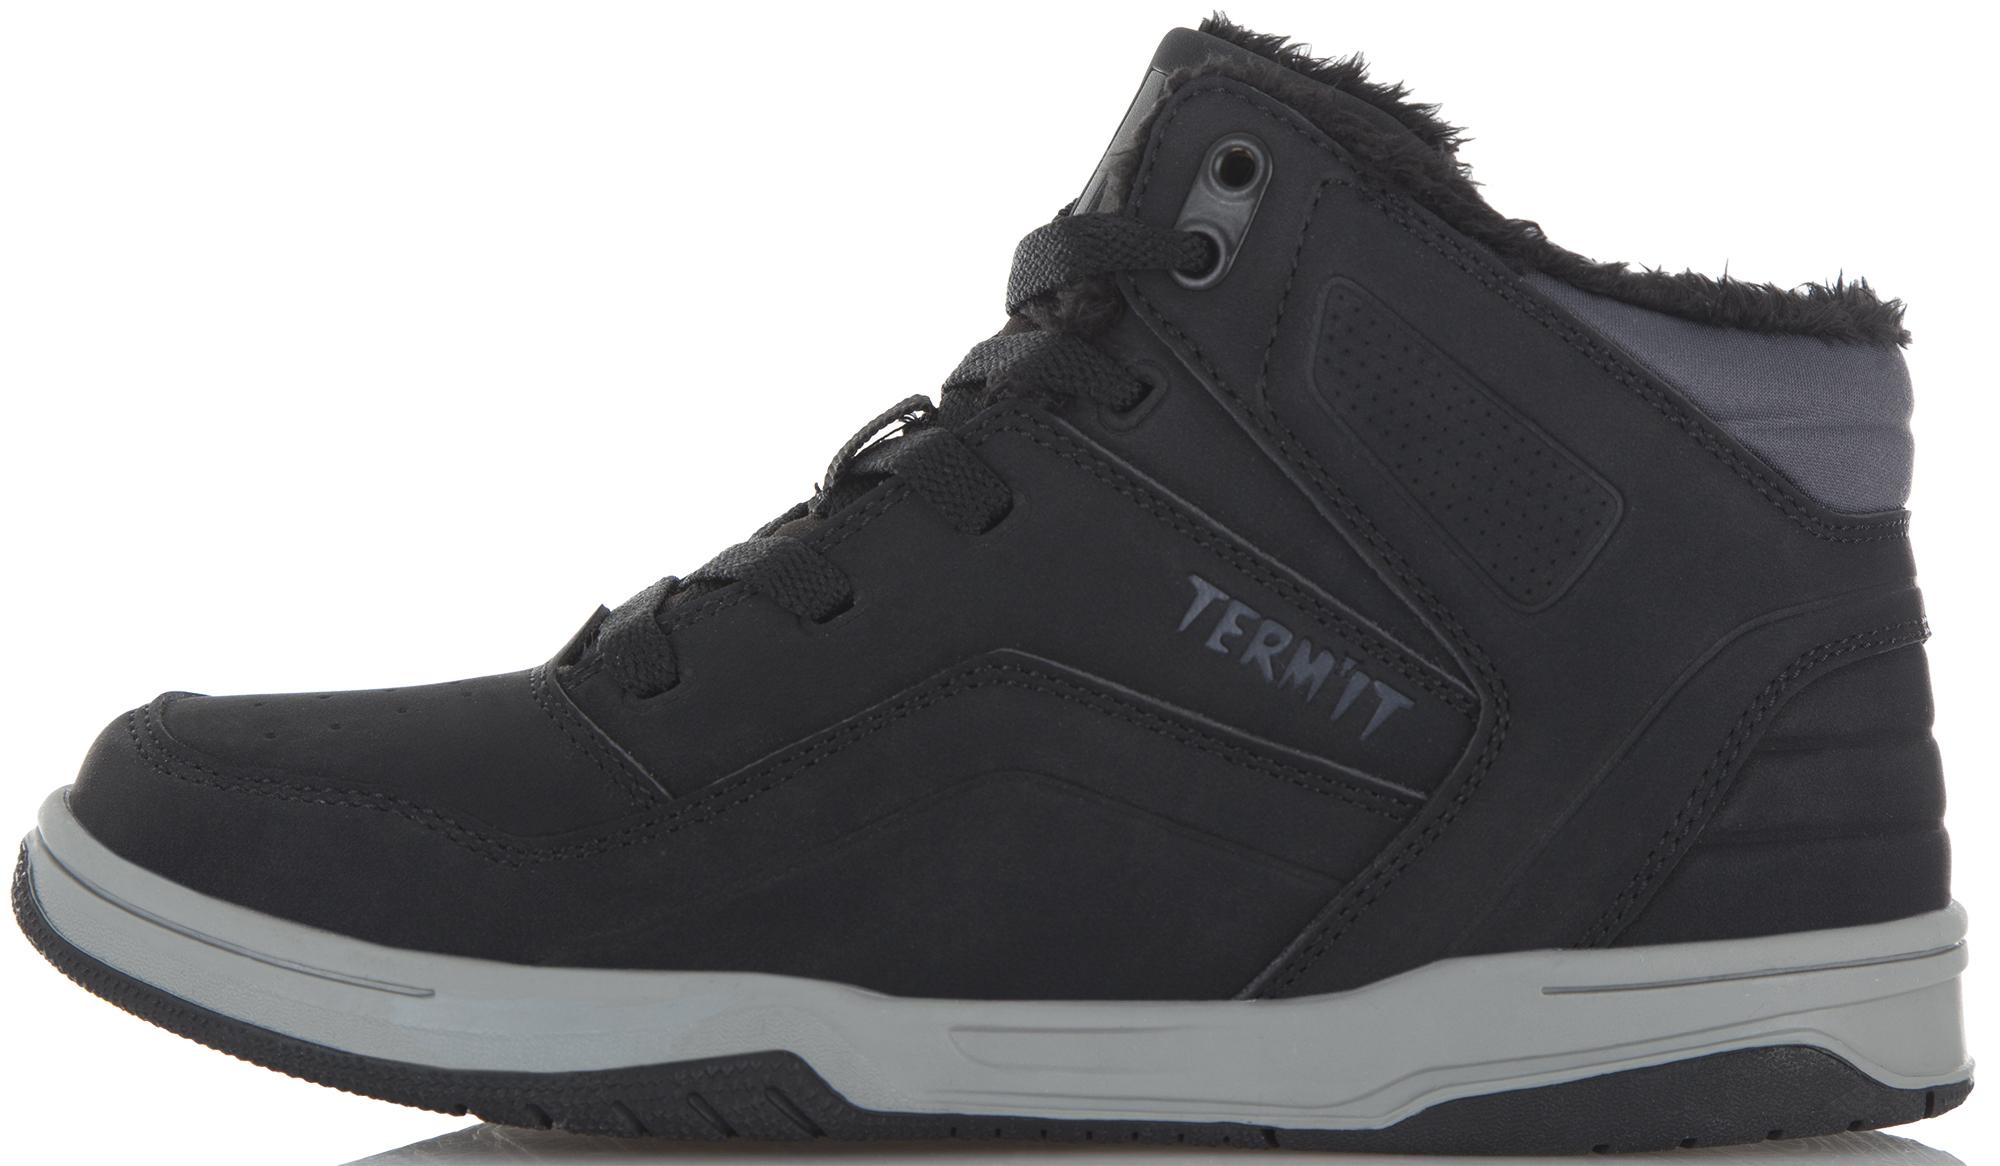 Termit Кеды для мальчиков Termit Bronx, размер 39